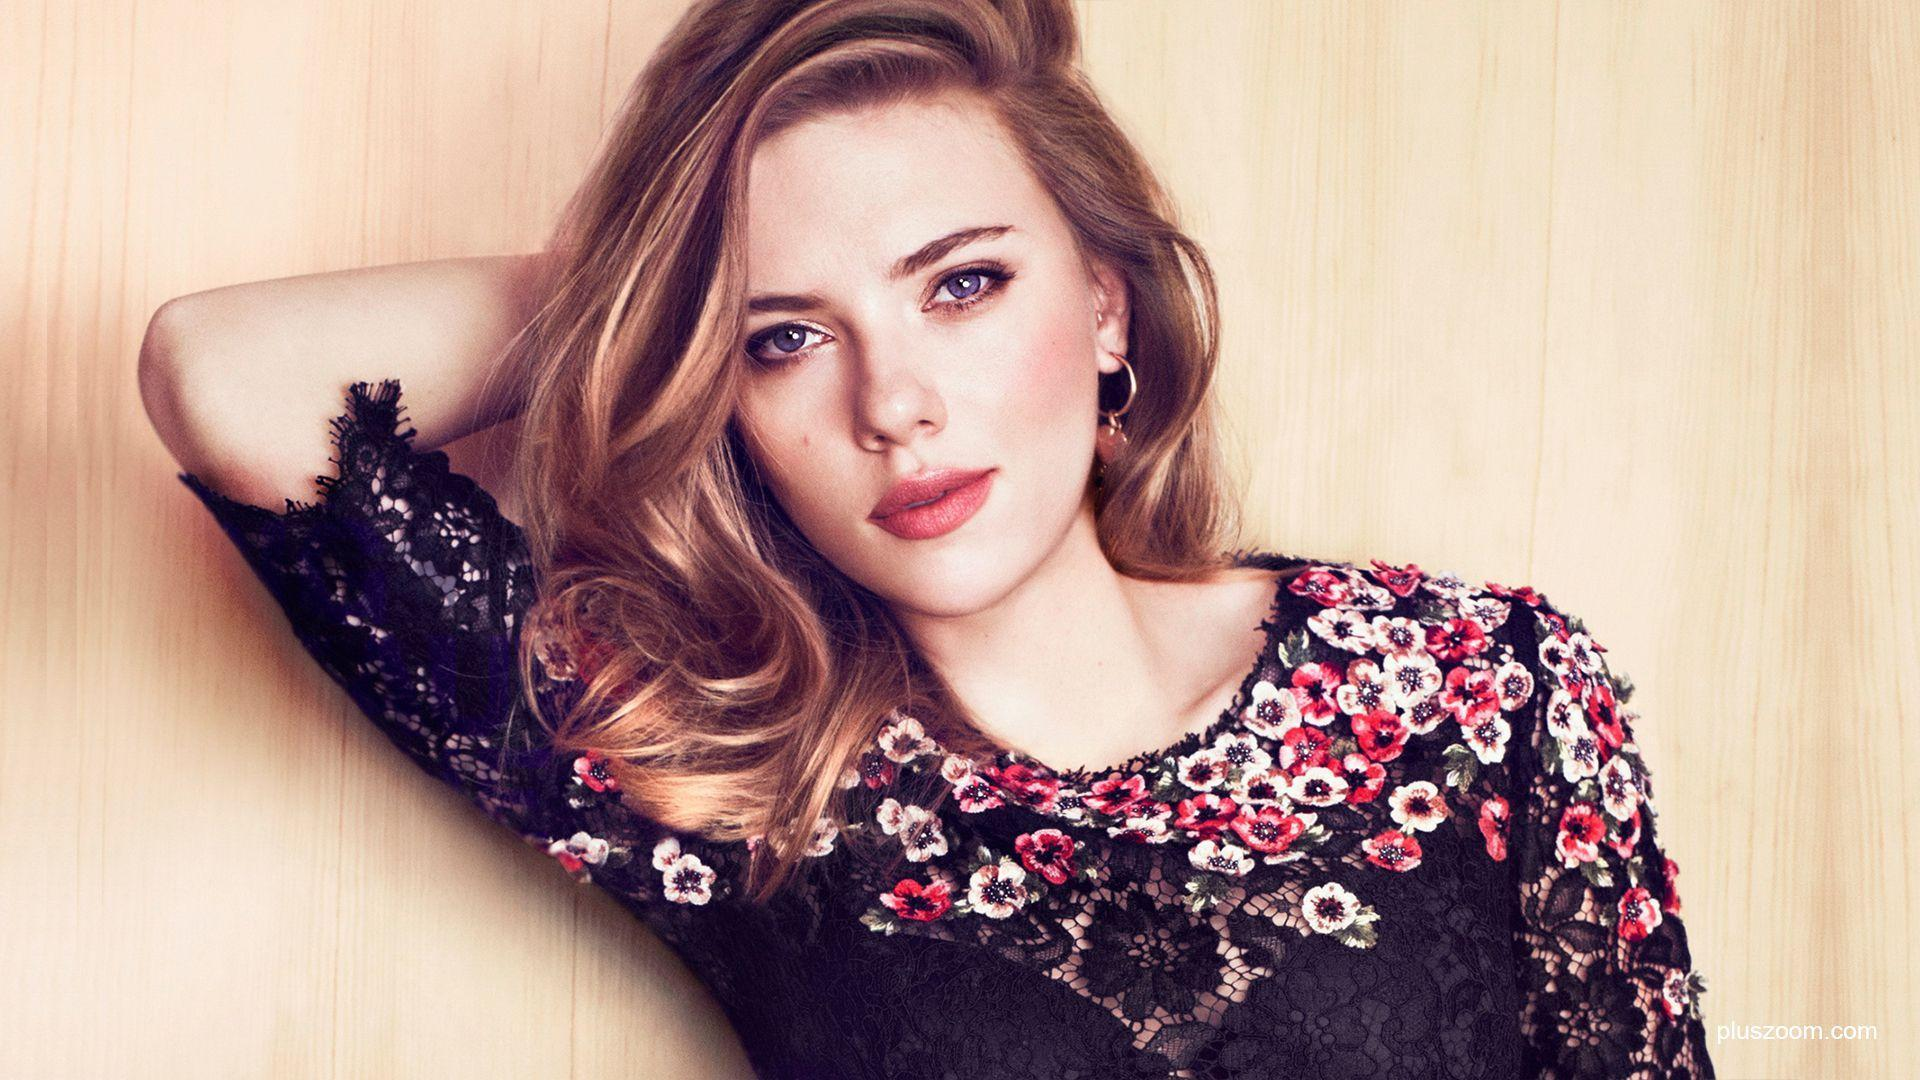 Free Hottest Hollywood Celebrities in 2014 Scarlett Johansson HD ...